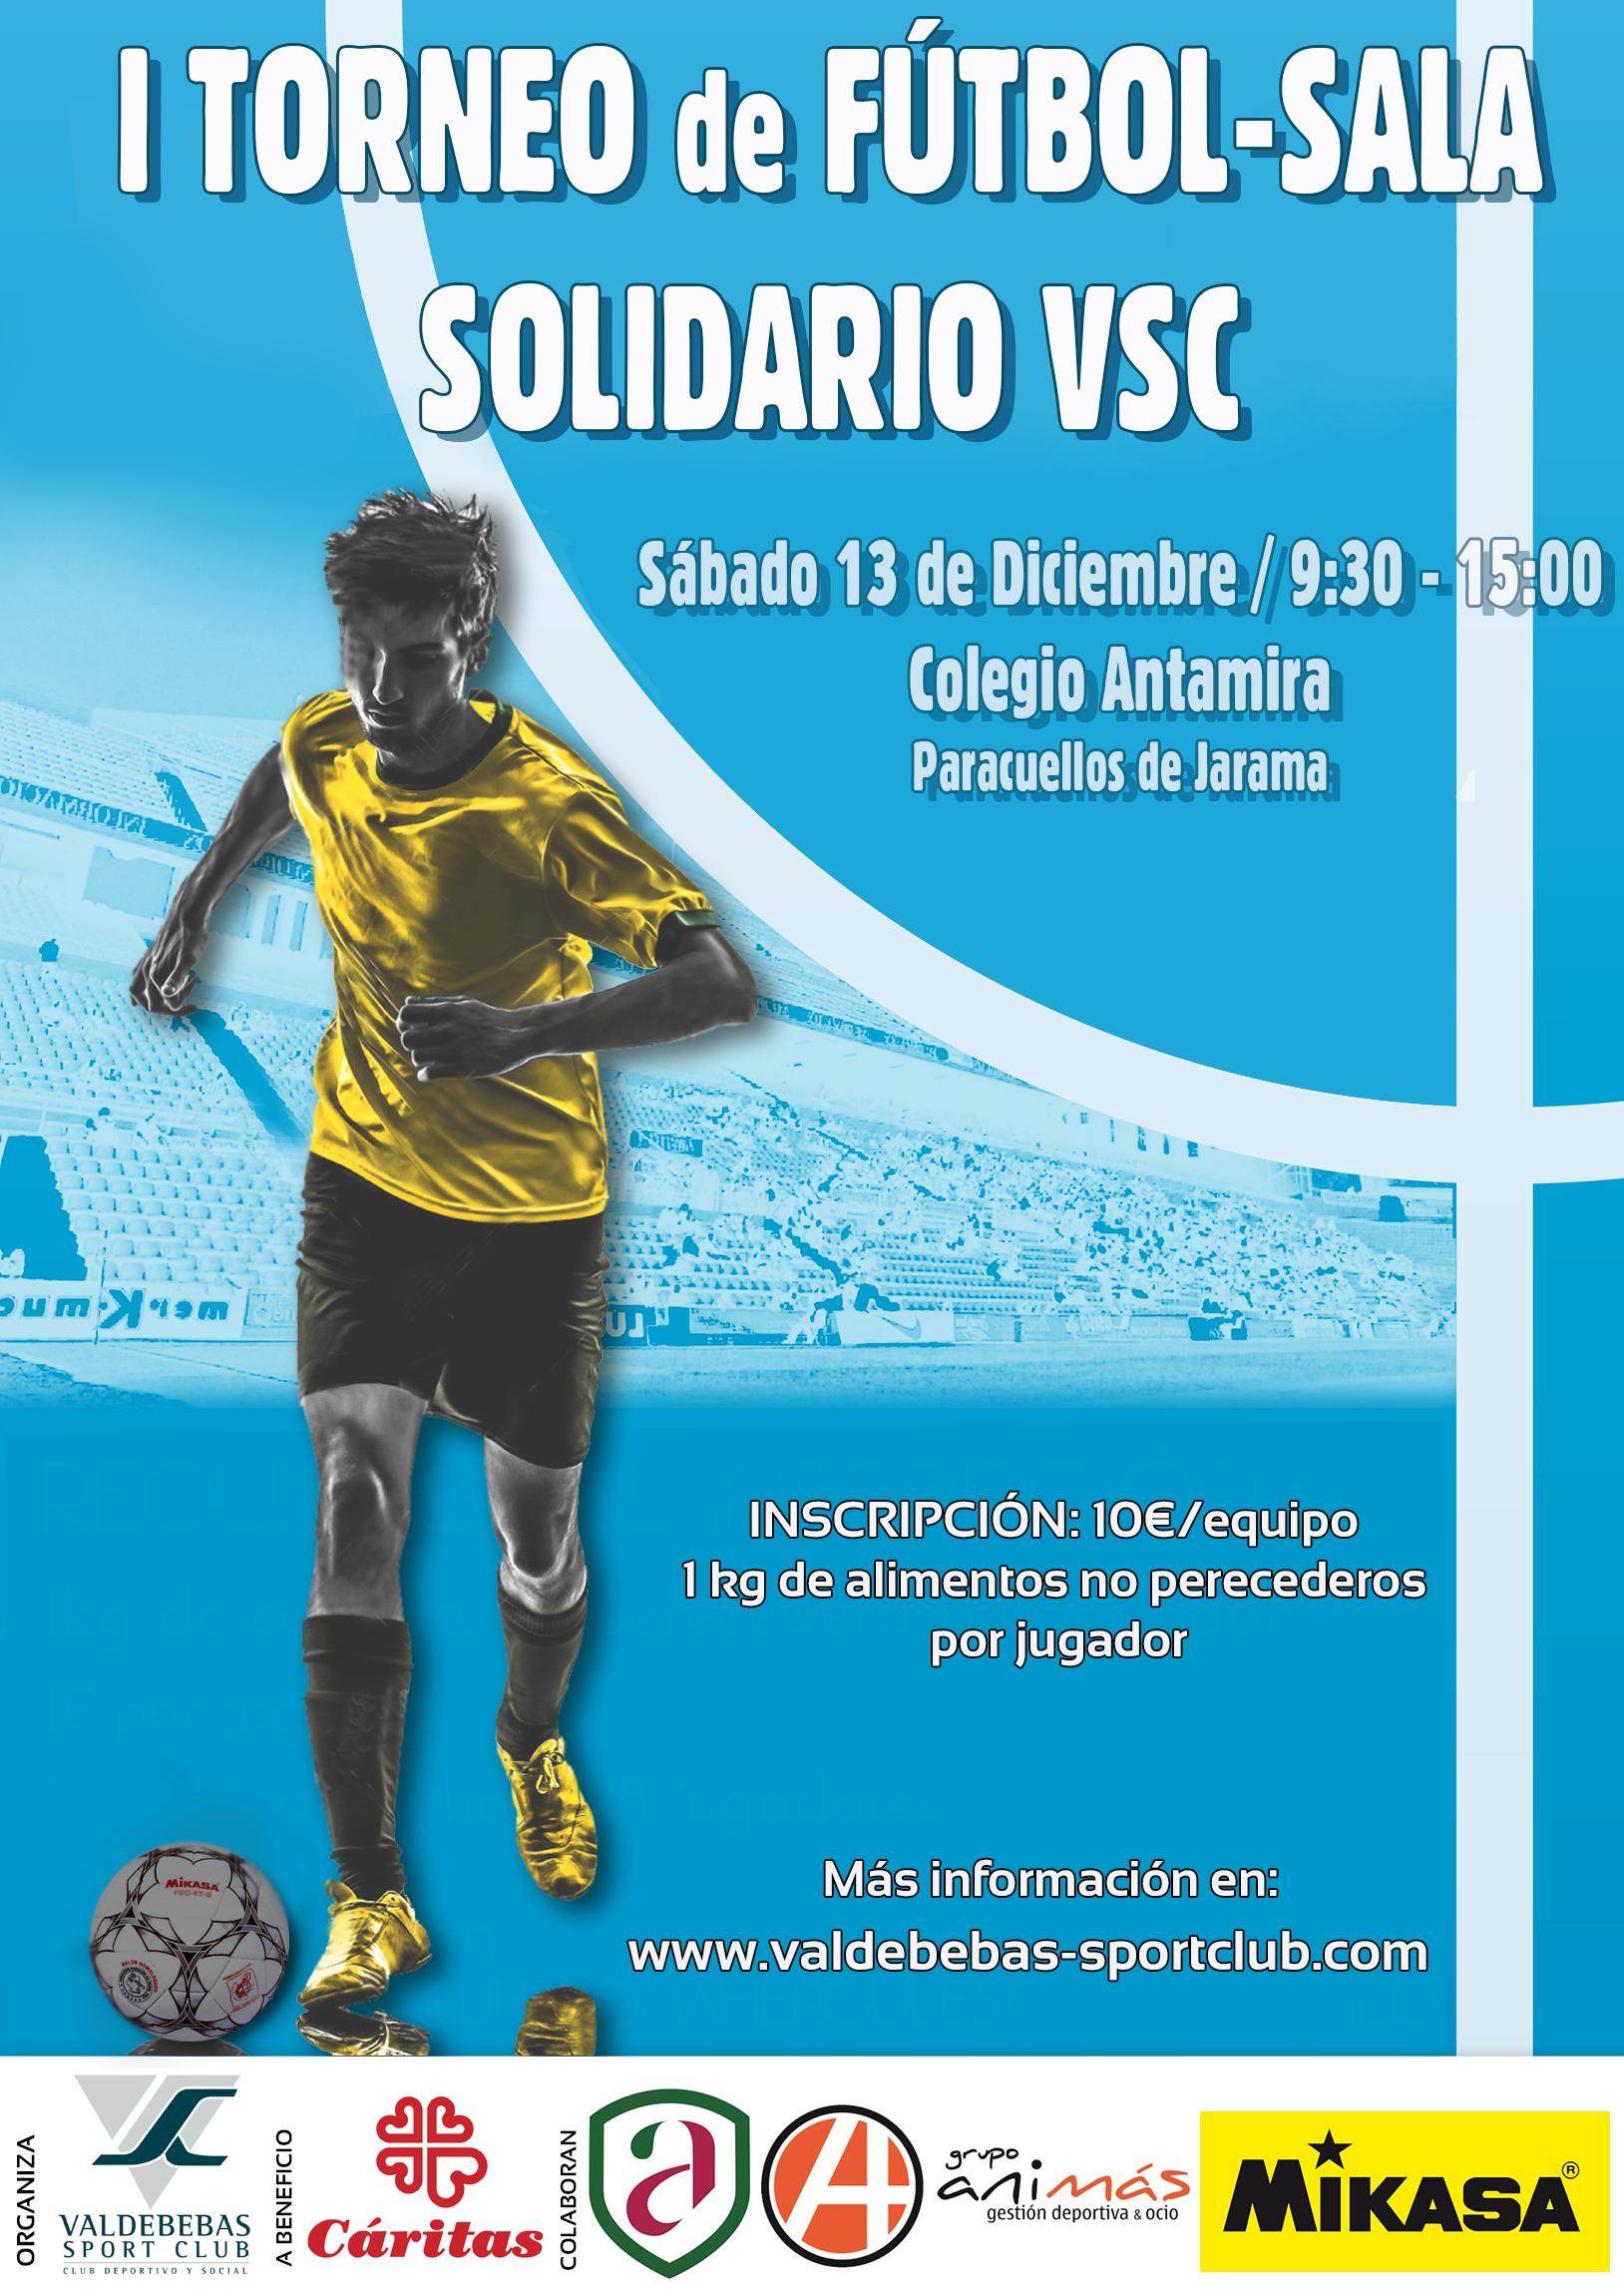 I Torneo Fútbol-Sala Solidario VSC